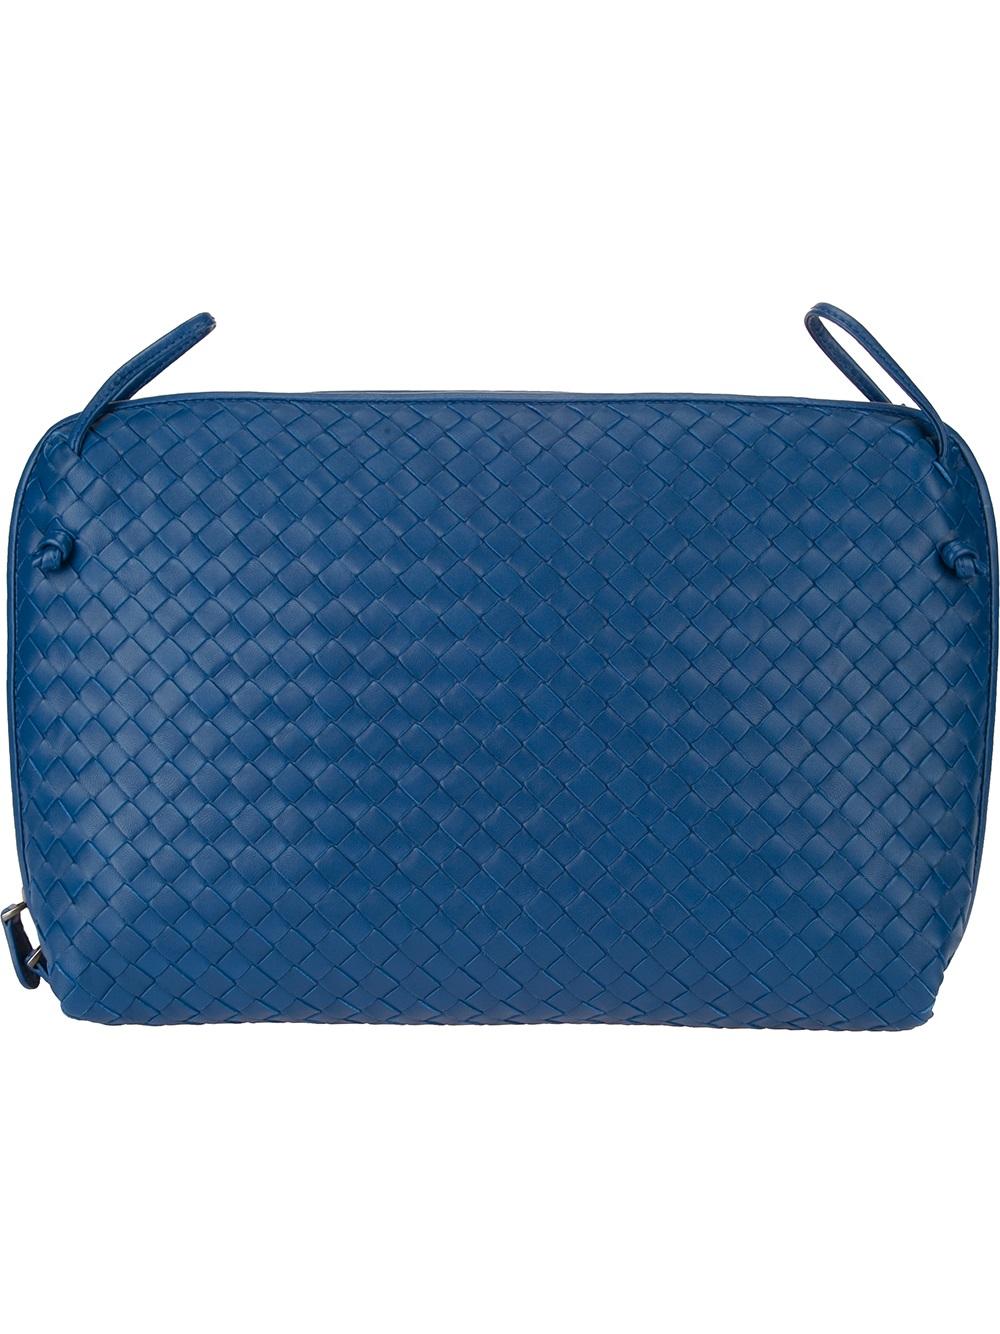 8369e060d61 Bottega Veneta Intrecciato Laptop Bag in Blue for Men - Lyst